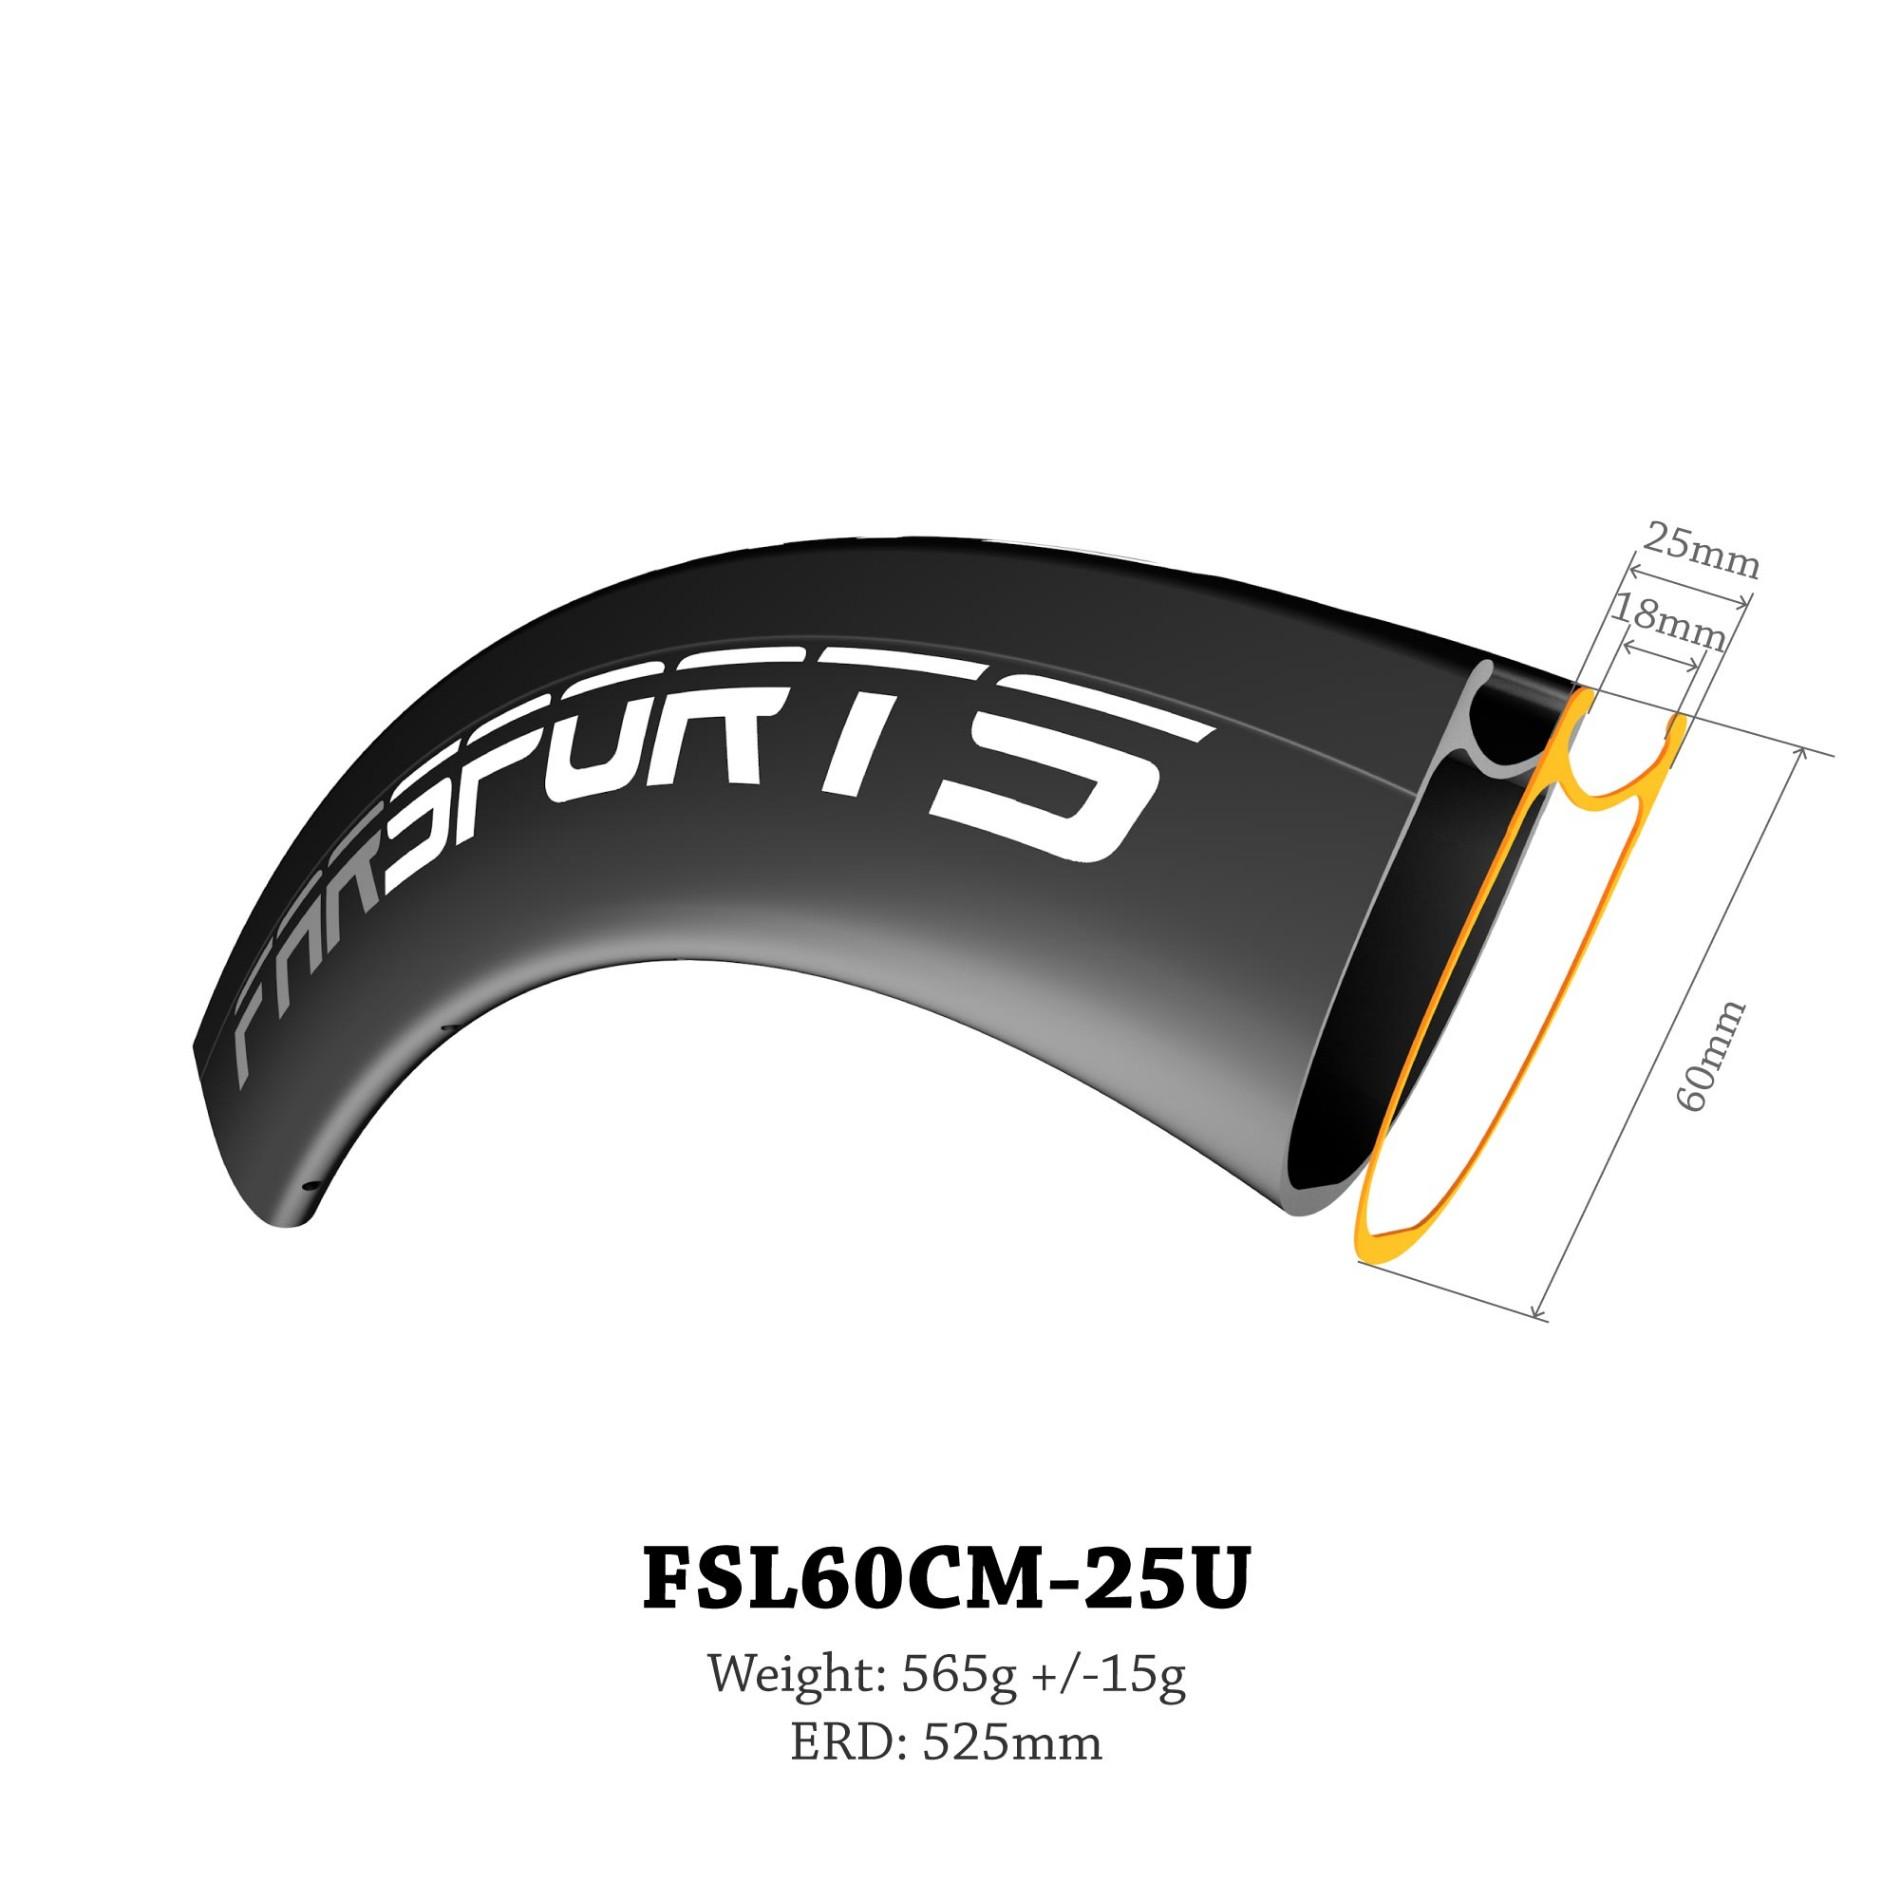 60mm X 25mm Carbon Clincher Wheels With Edhub Manufacturers, 60mm X 25mm Carbon Clincher Wheels With Edhub Factory, Supply 60mm X 25mm Carbon Clincher Wheels With Edhub